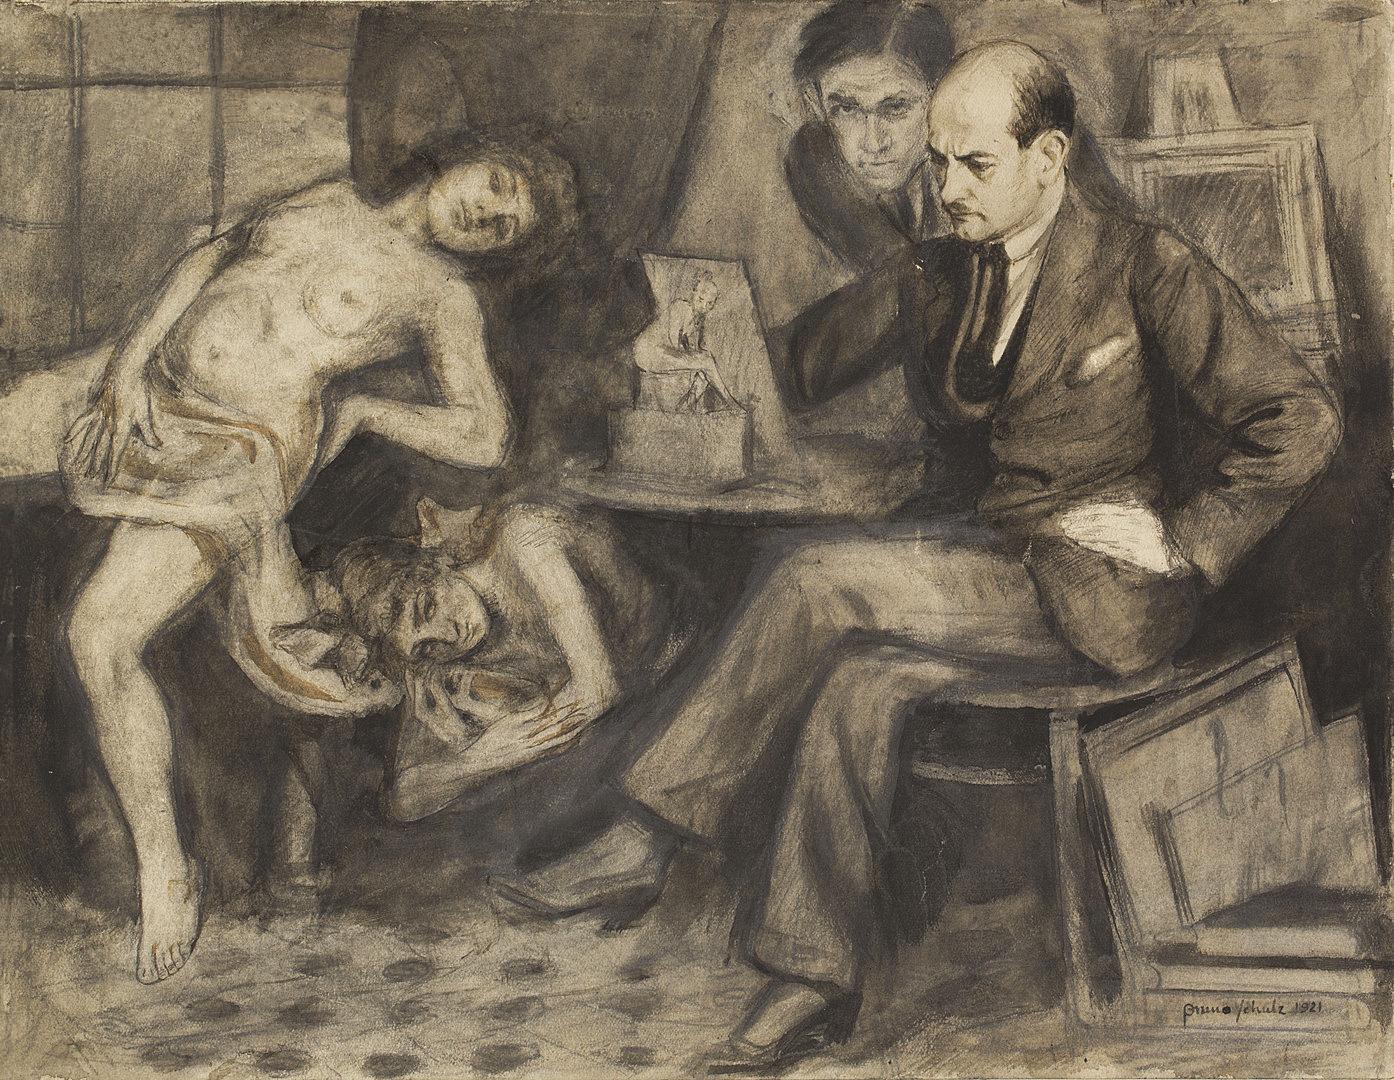 Бруно Шульц. Дві моделі, Б Шульц, С Вайнгарт, 1921; папір, олівець; JHI